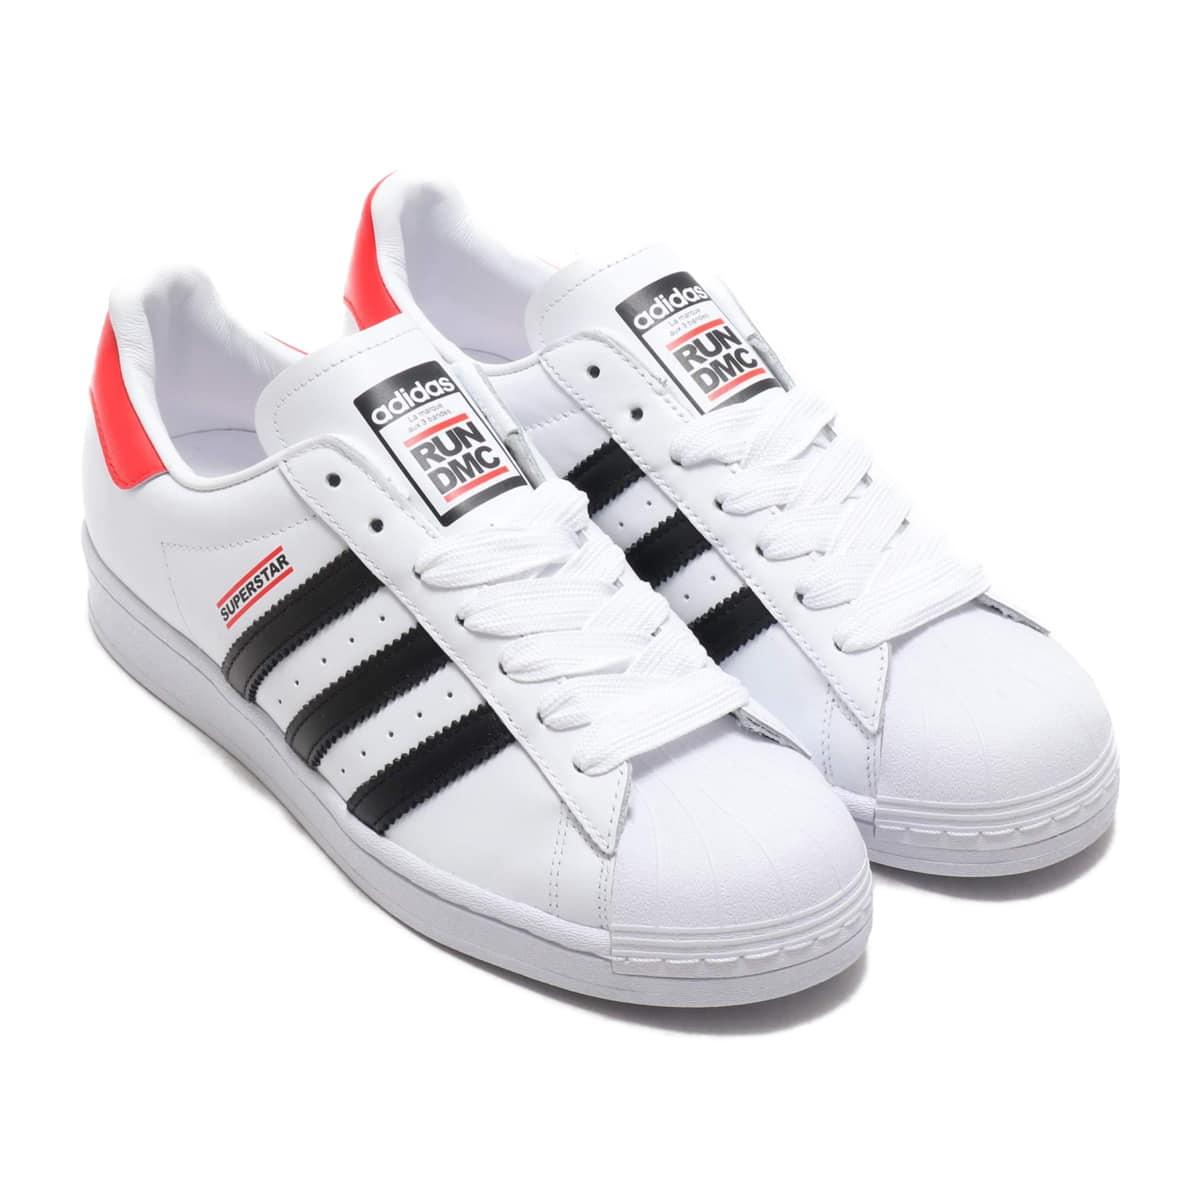 adidas SUPERSTAR 50 RUN DMC FOOTWEAR WHITE/CORE BLACK/HIGHREZ RED 20SS-S_photo_large